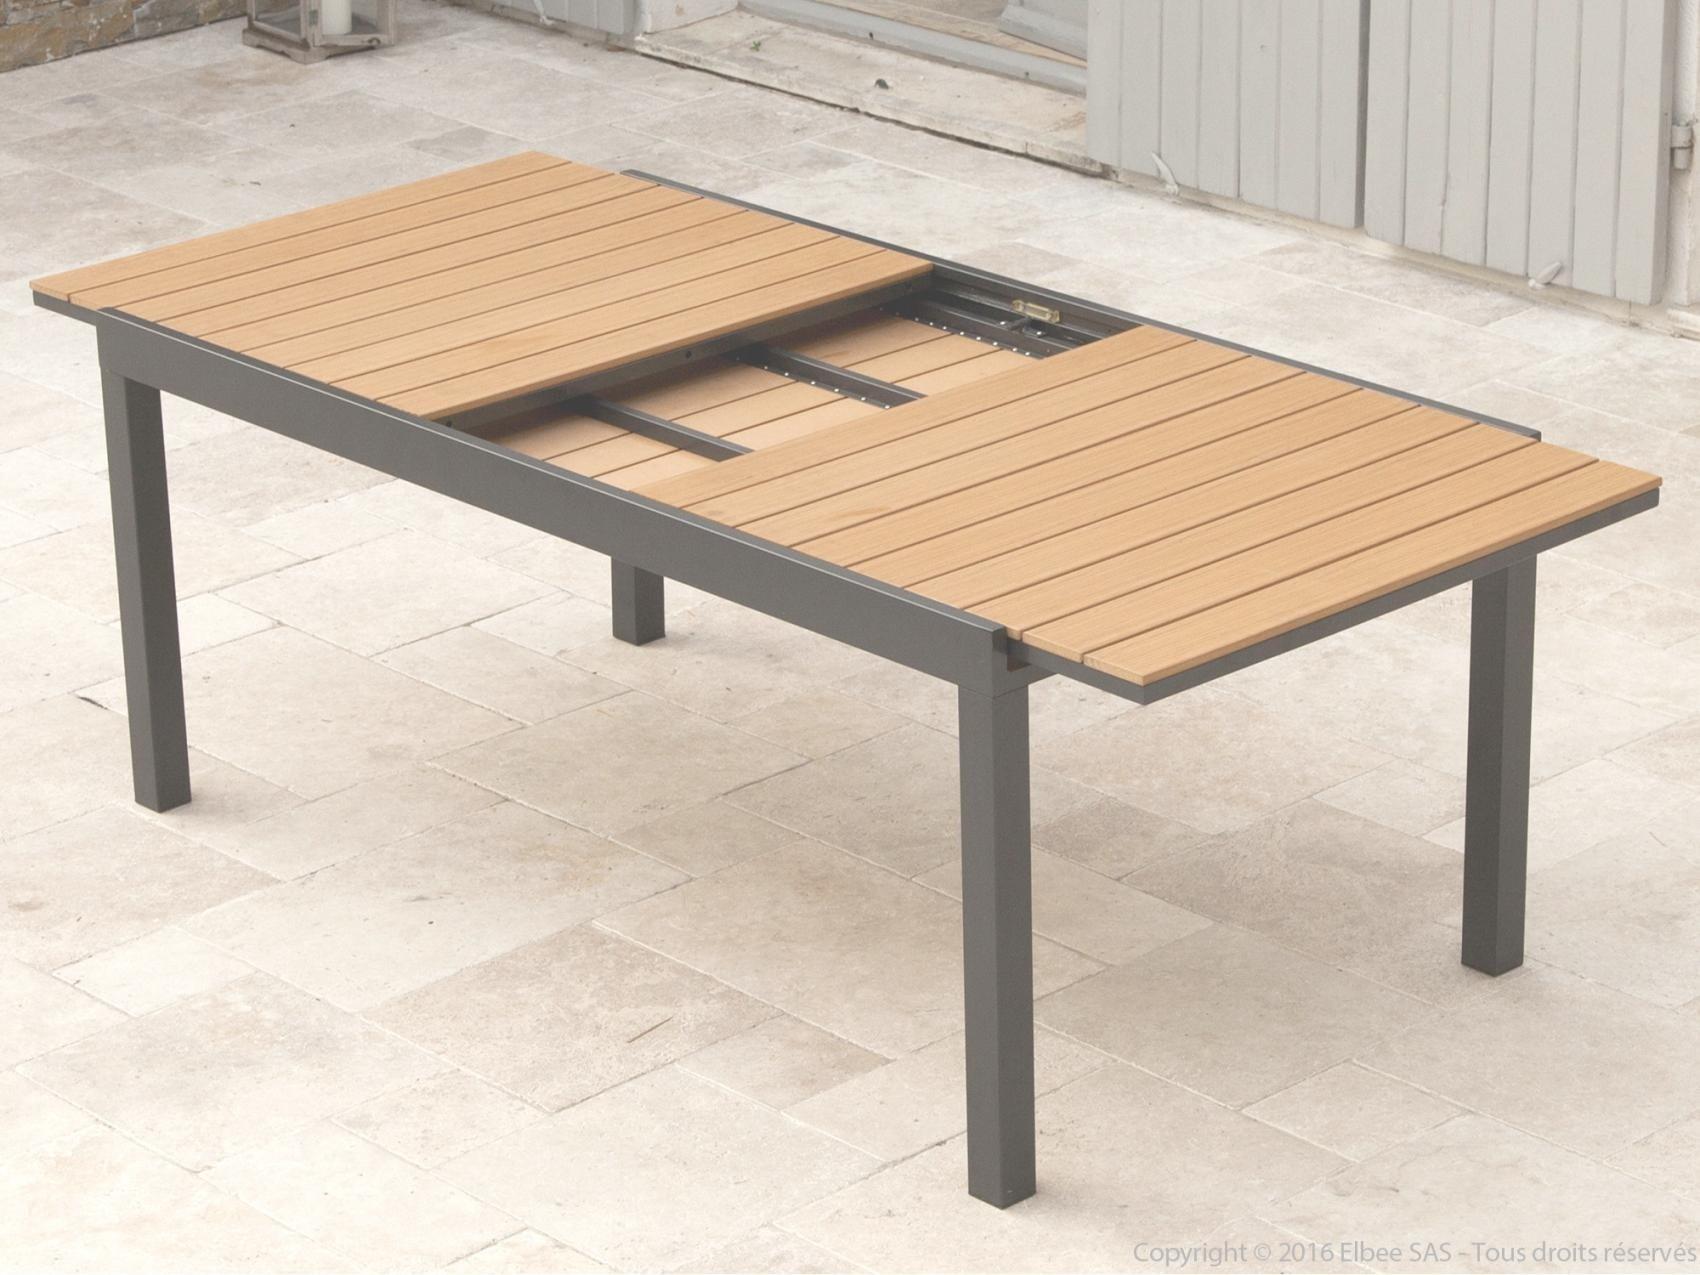 Salon De Jardin Table Extensible Pas Cher - Mailleraye.fr destiné Salon De Jardin Aluminium Pas Cher